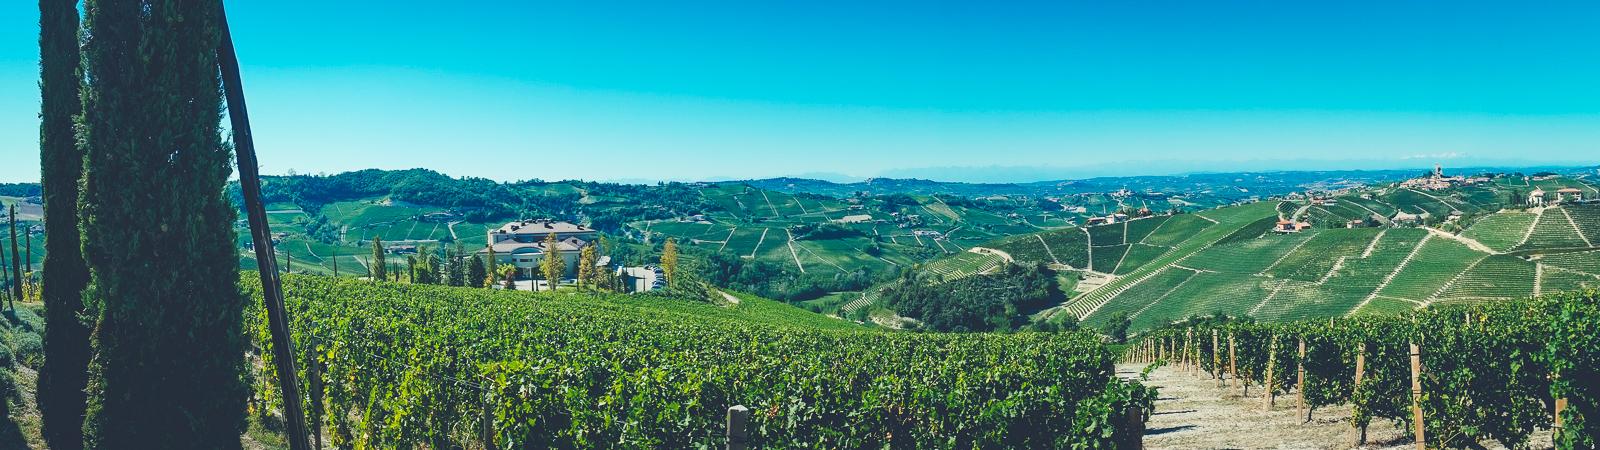 Calosso - Piedmont Panorama